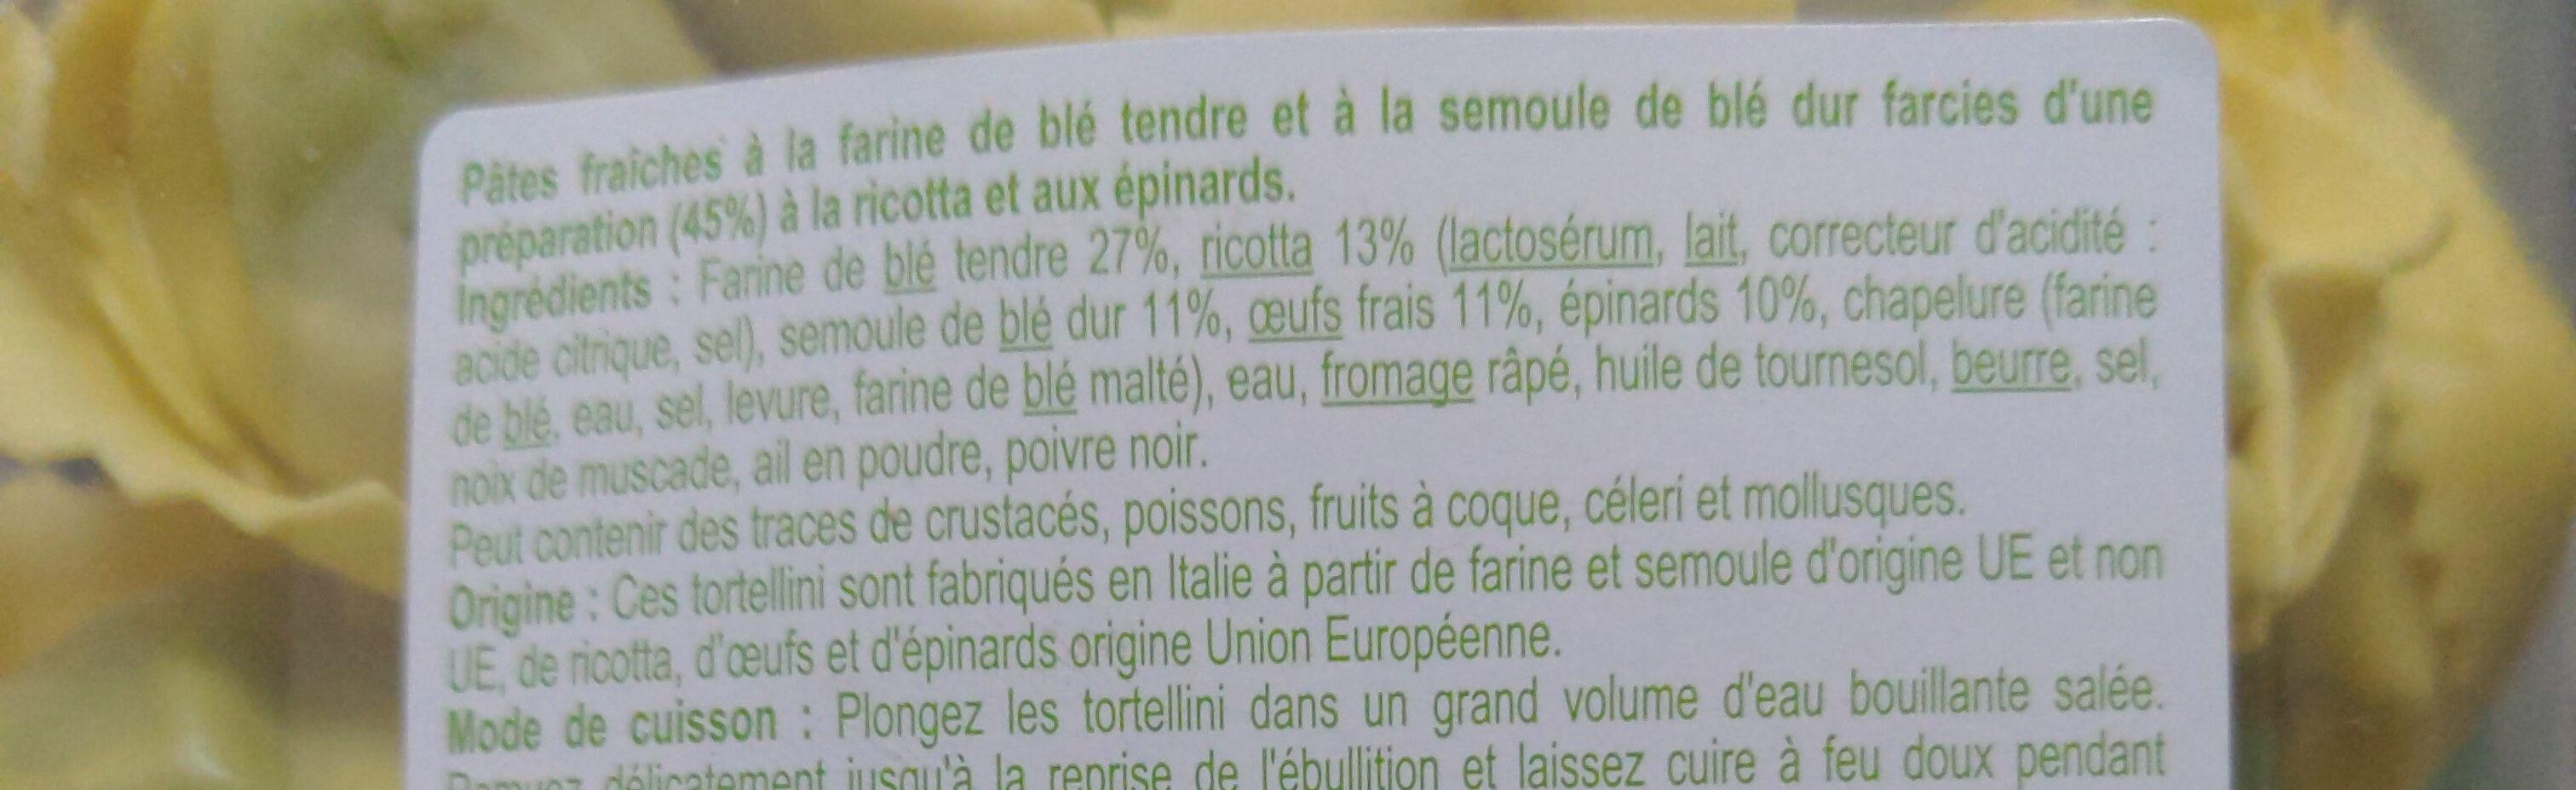 Tortellini ricotta épinard - Ingrediënten - fr